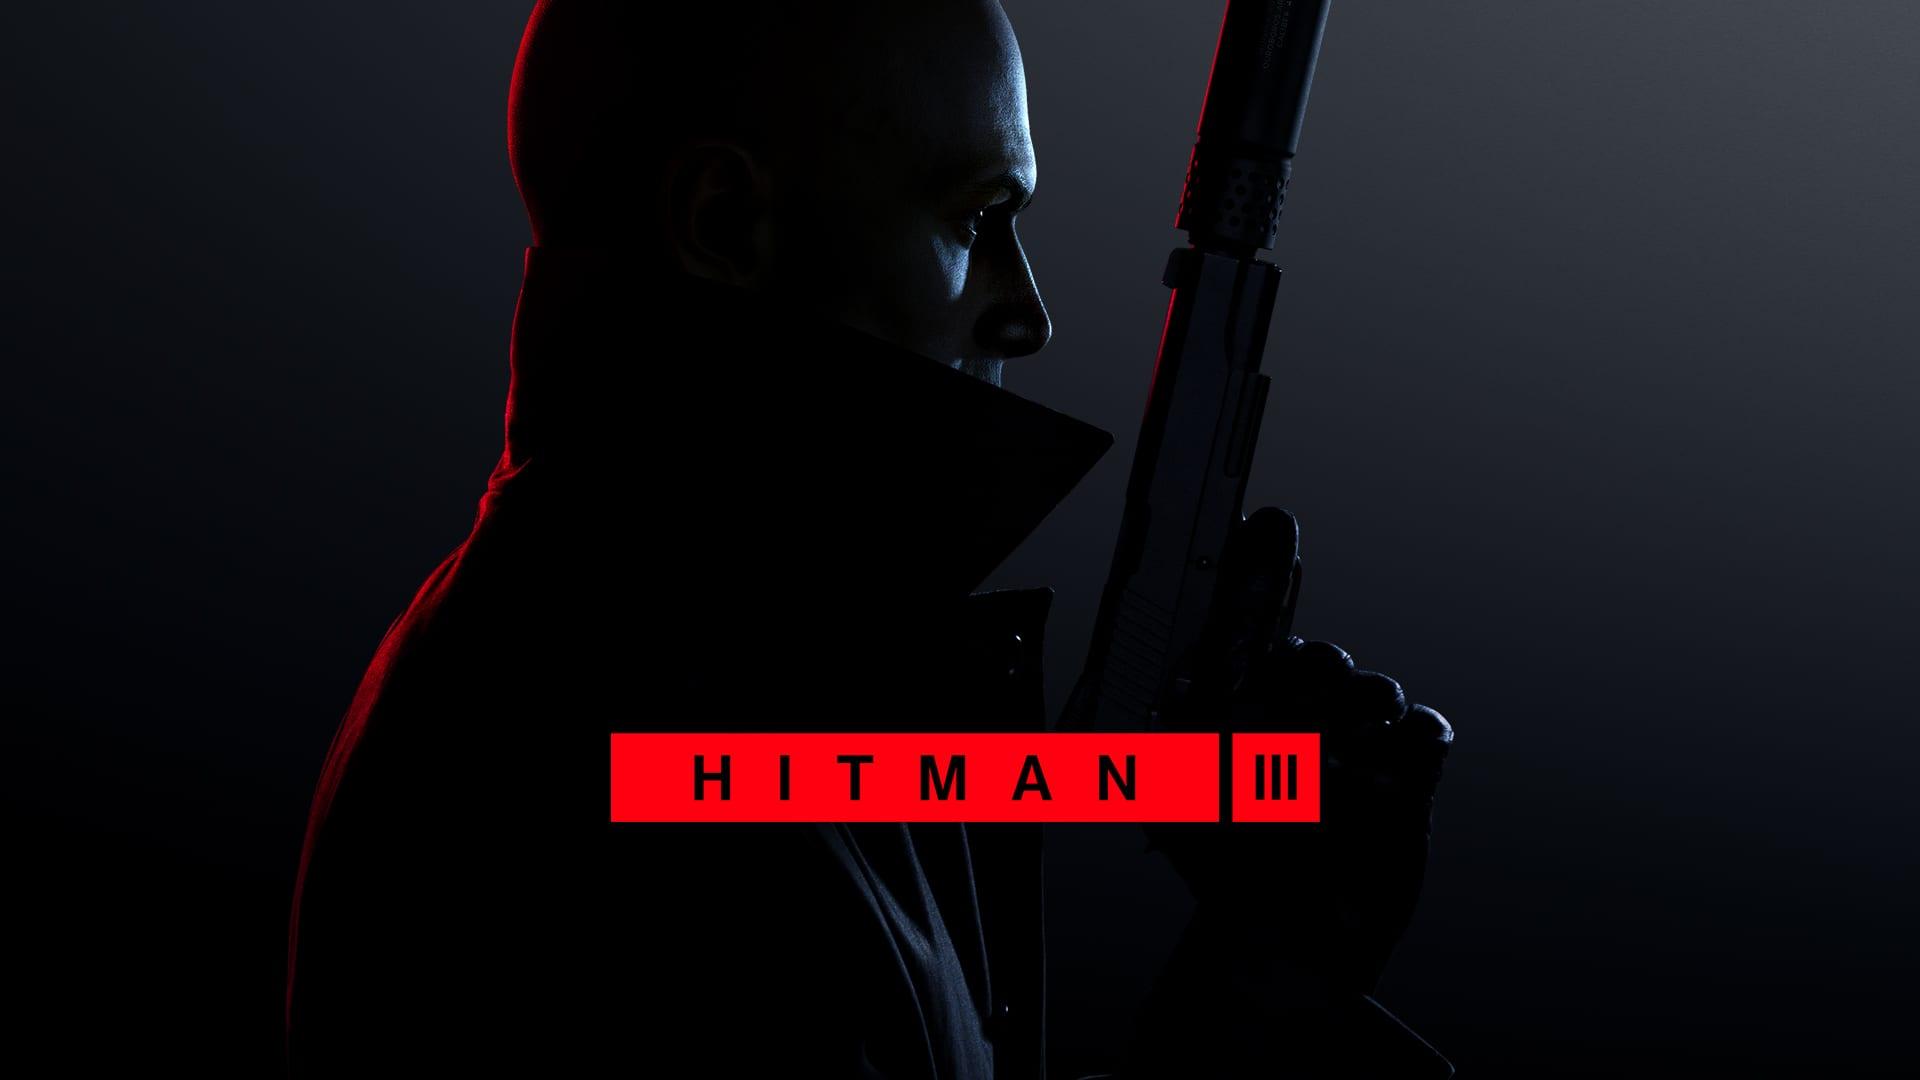 Hitman Starter Pack Releases Today